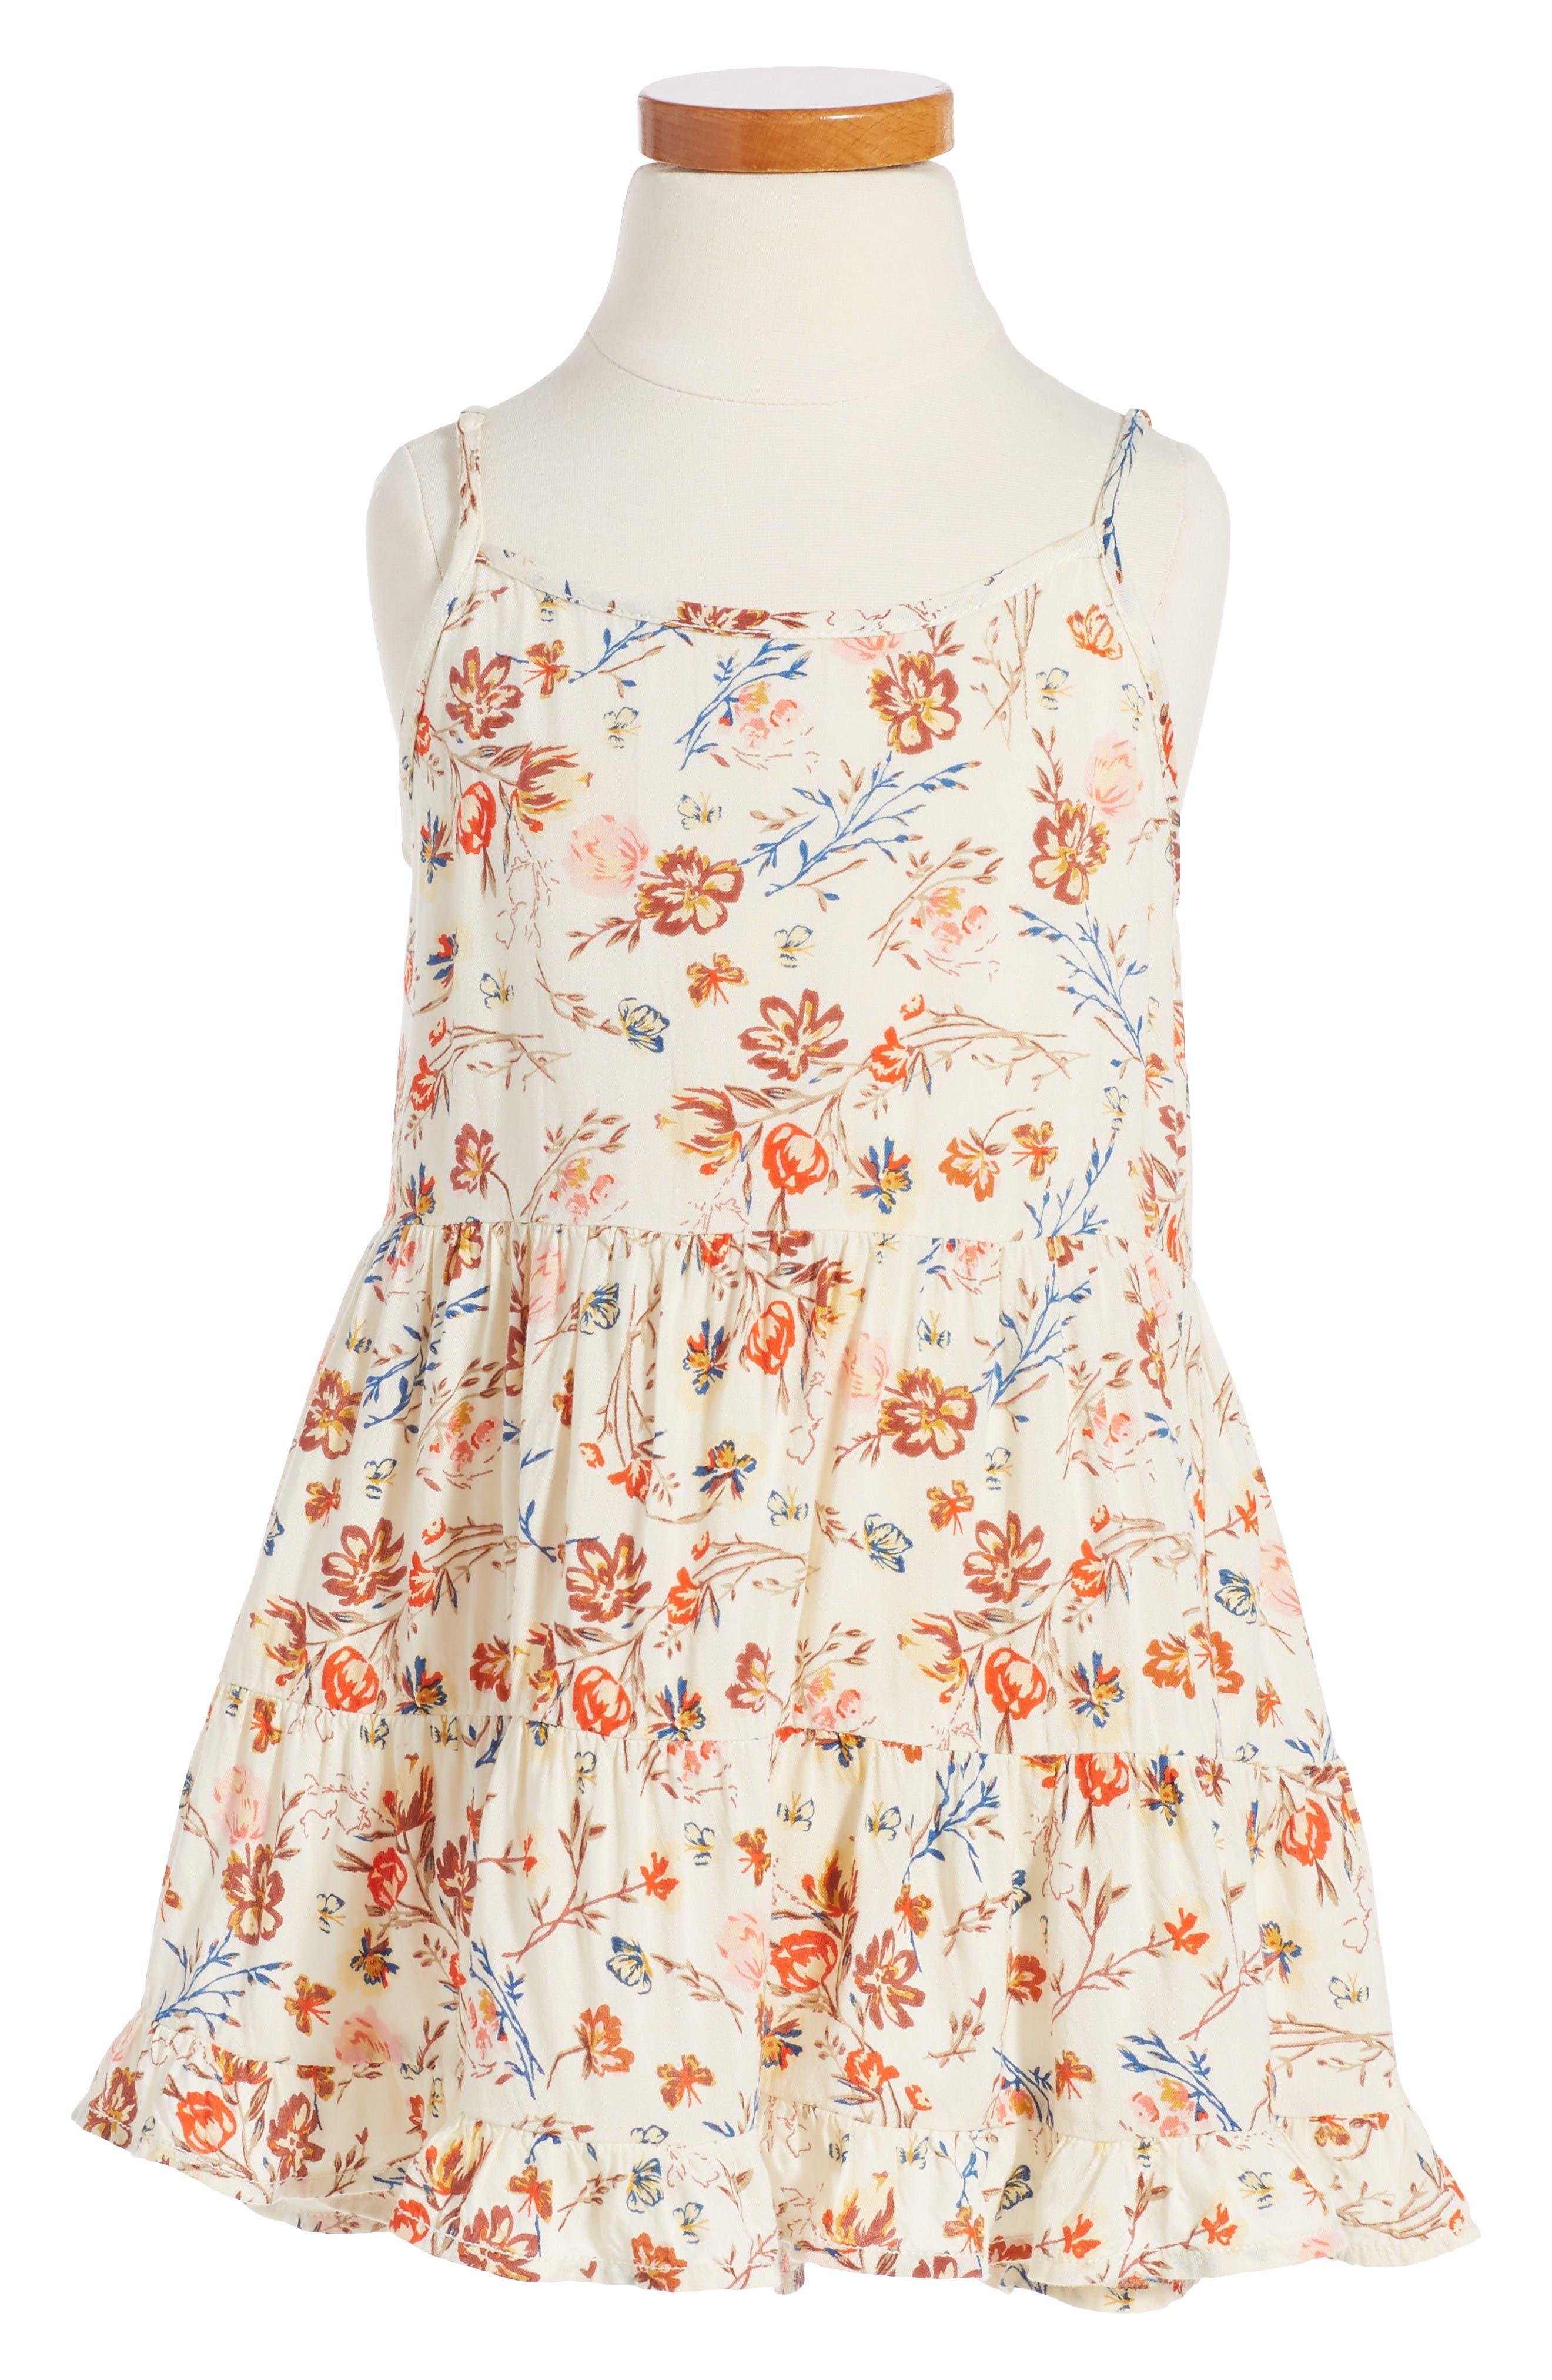 PEEK Khristene Floral Print Dress